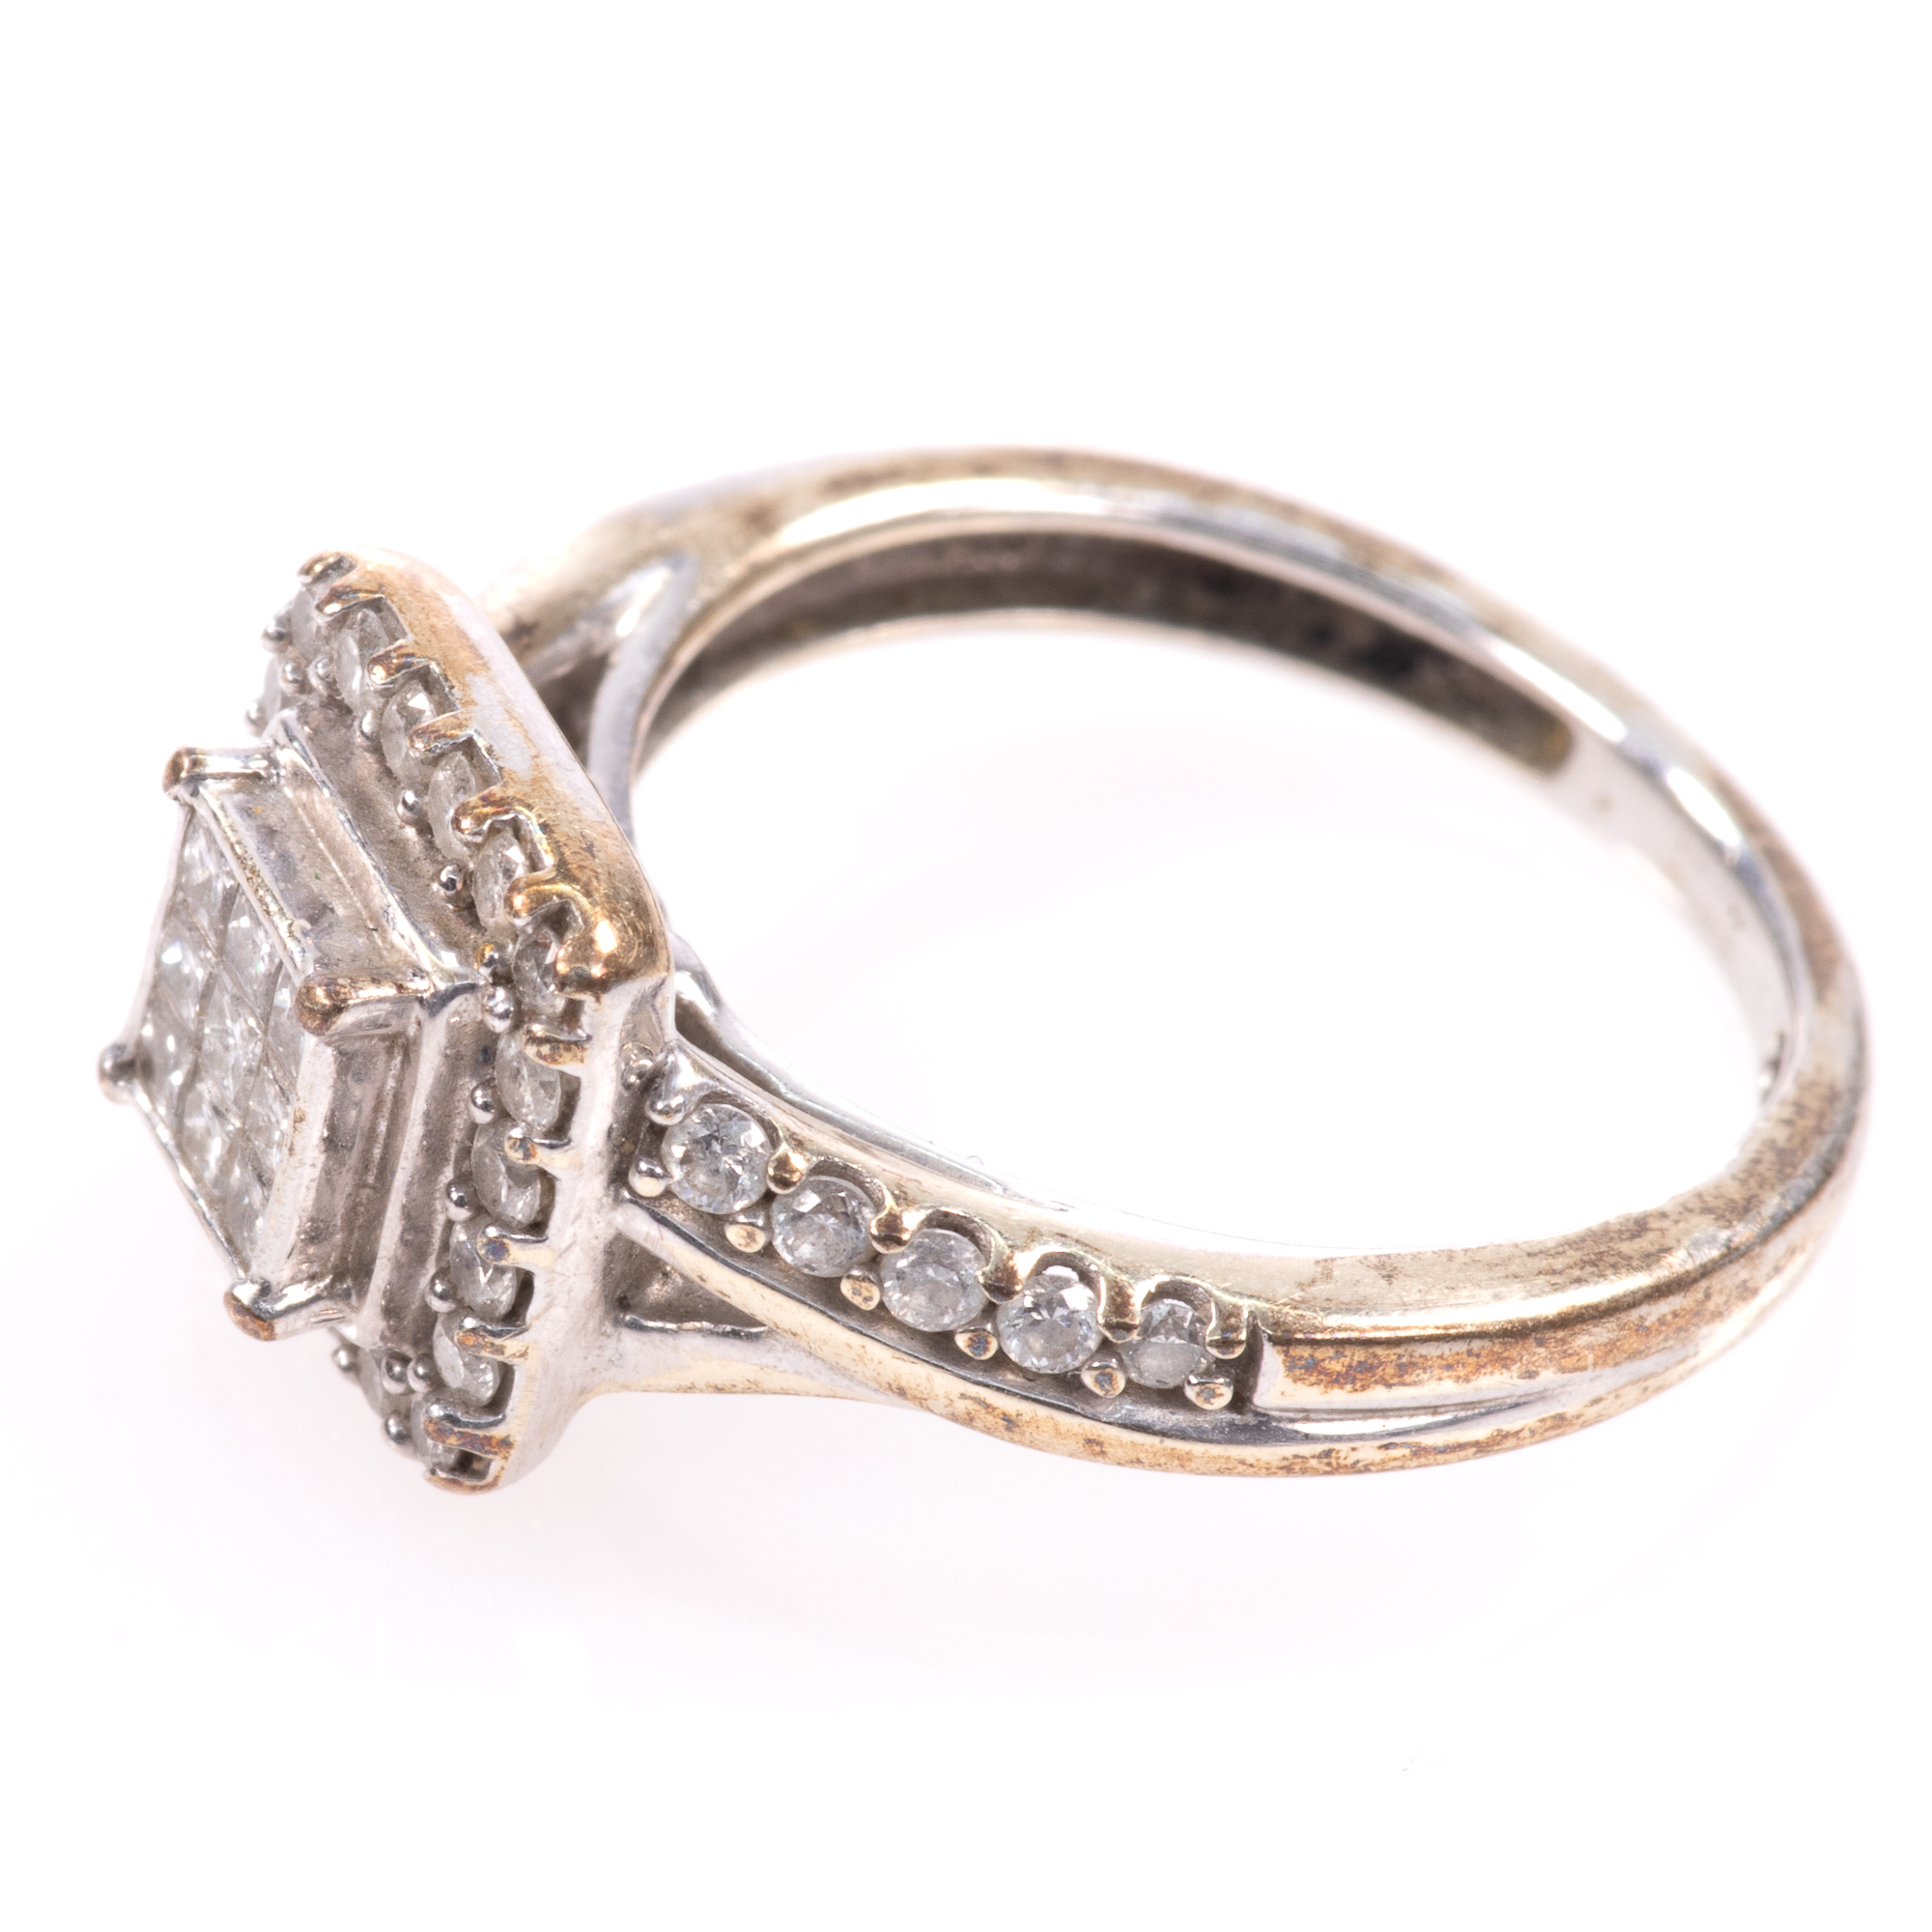 9ct White Gold 0.40ct Diamond Ring - Image 4 of 6